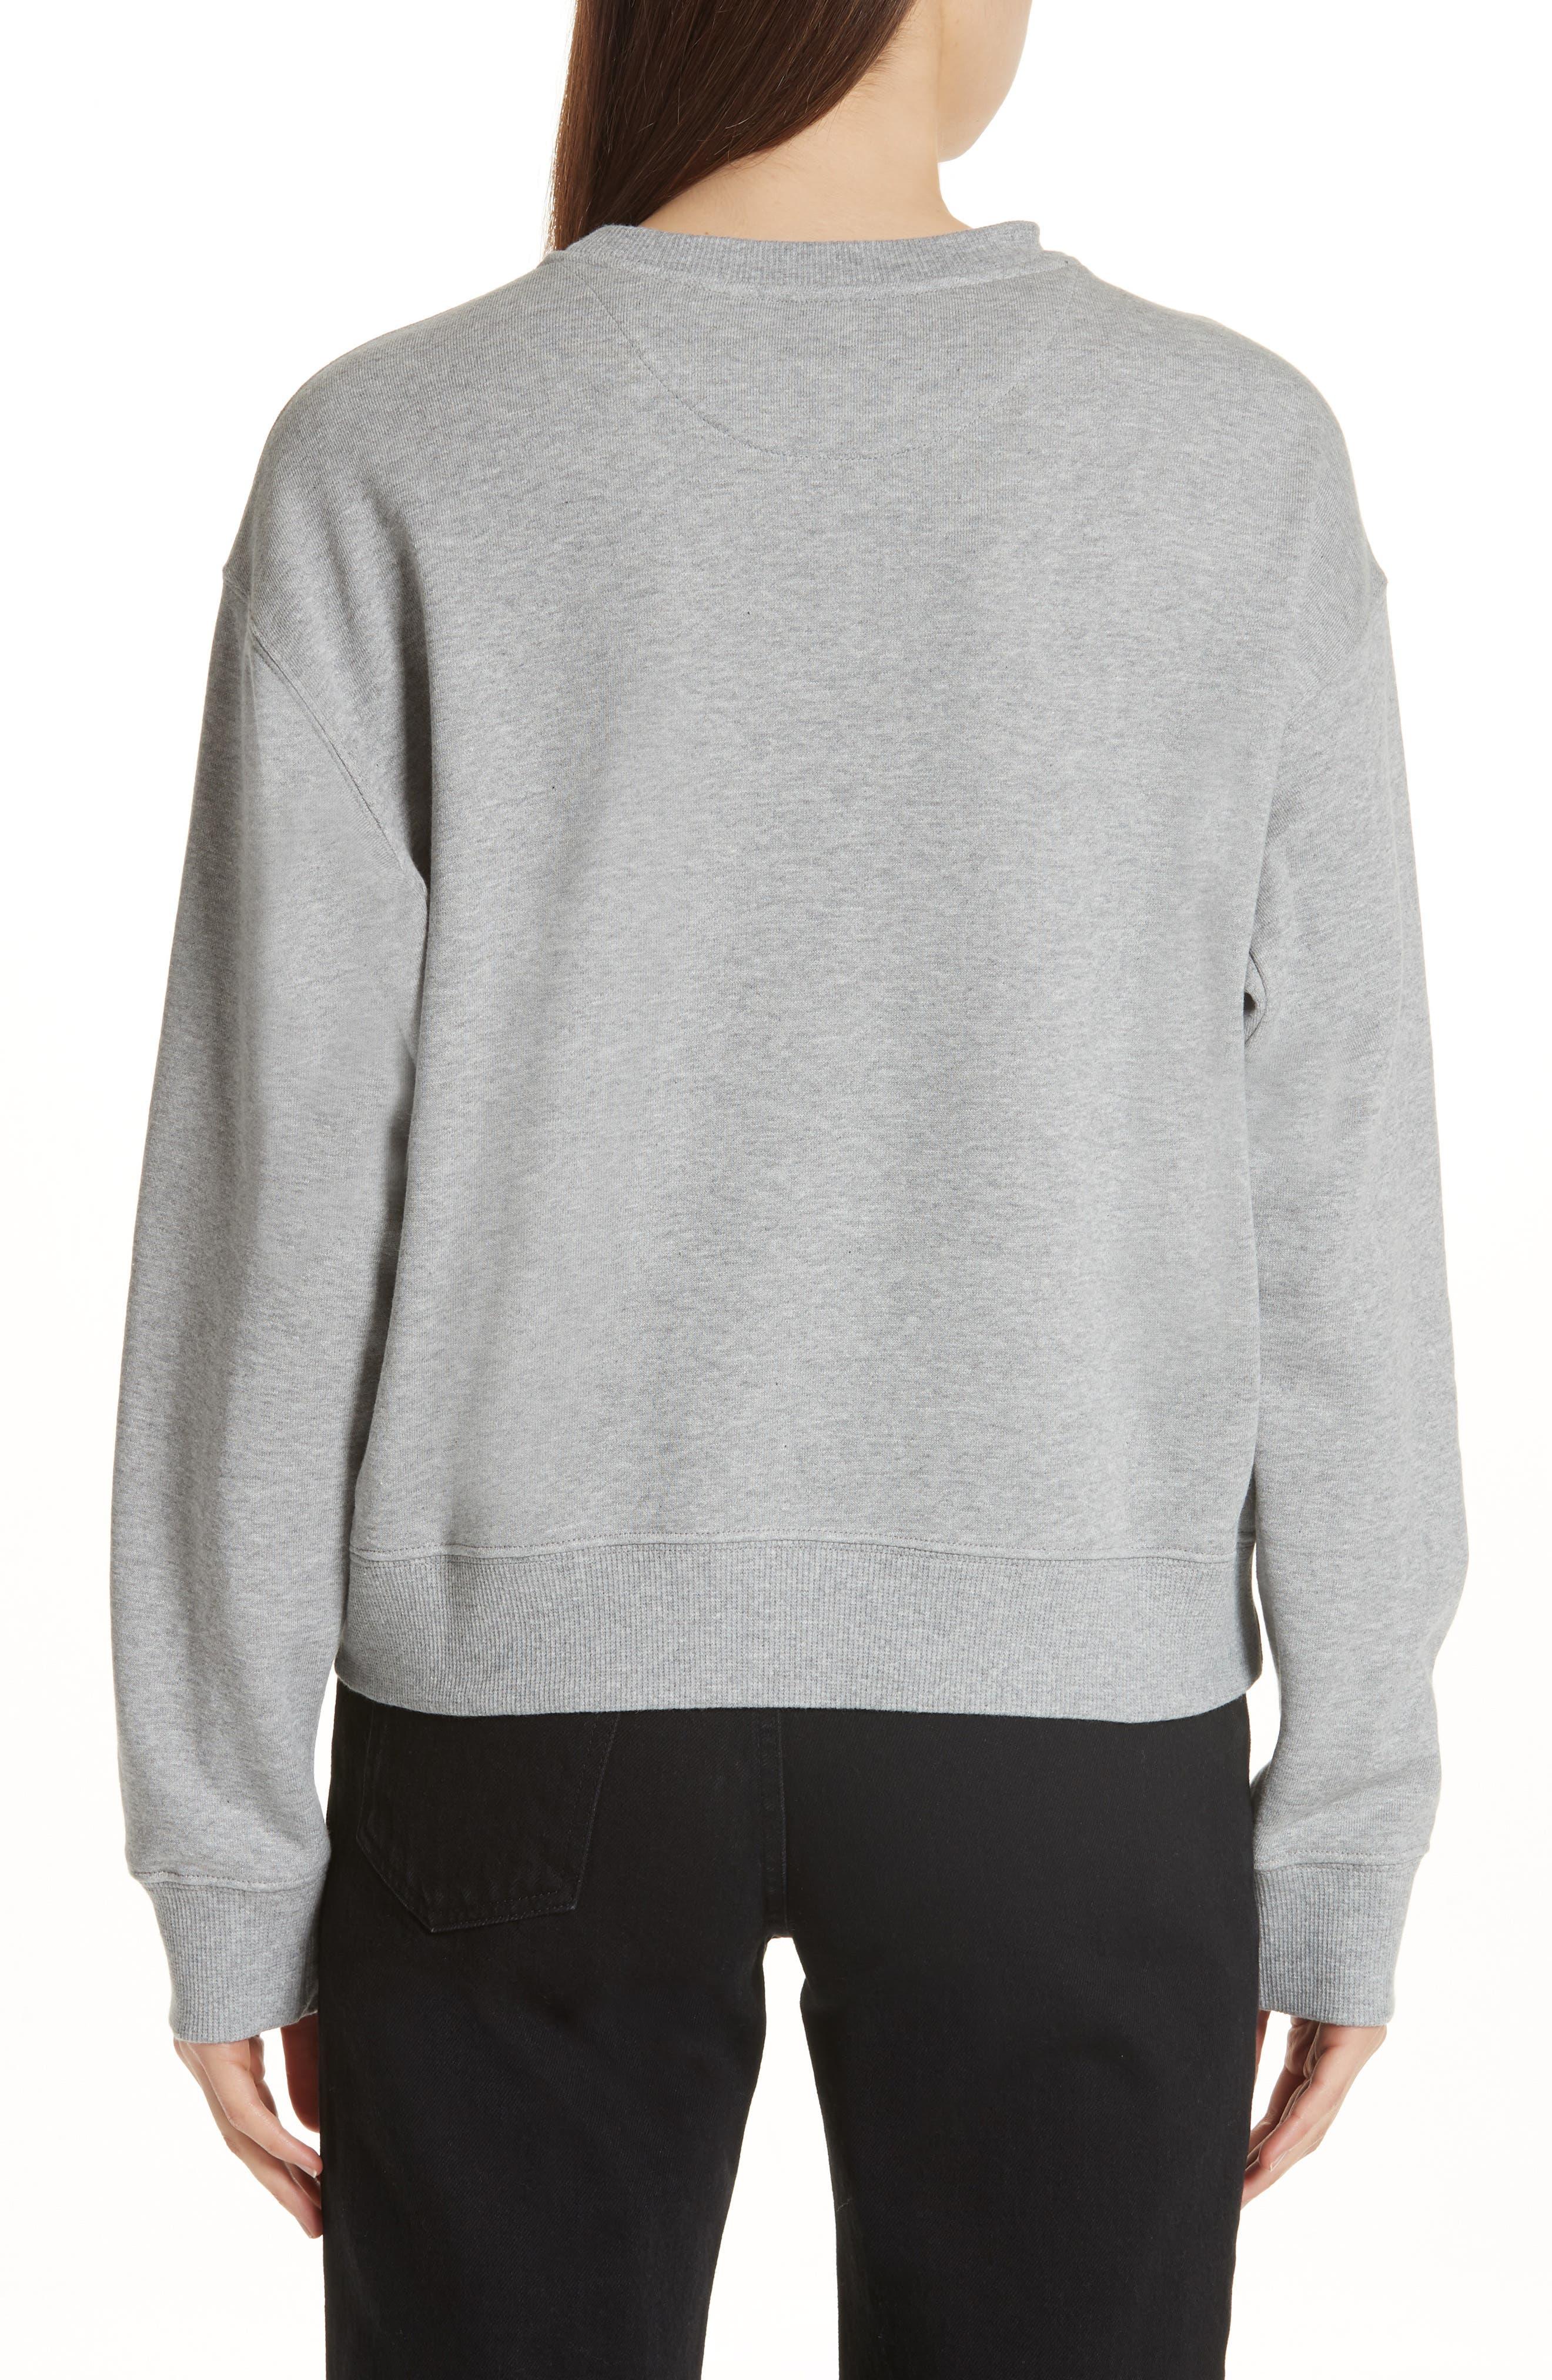 Brooke Shields Patch Sweatshirt,                             Alternate thumbnail 2, color,                             Grey